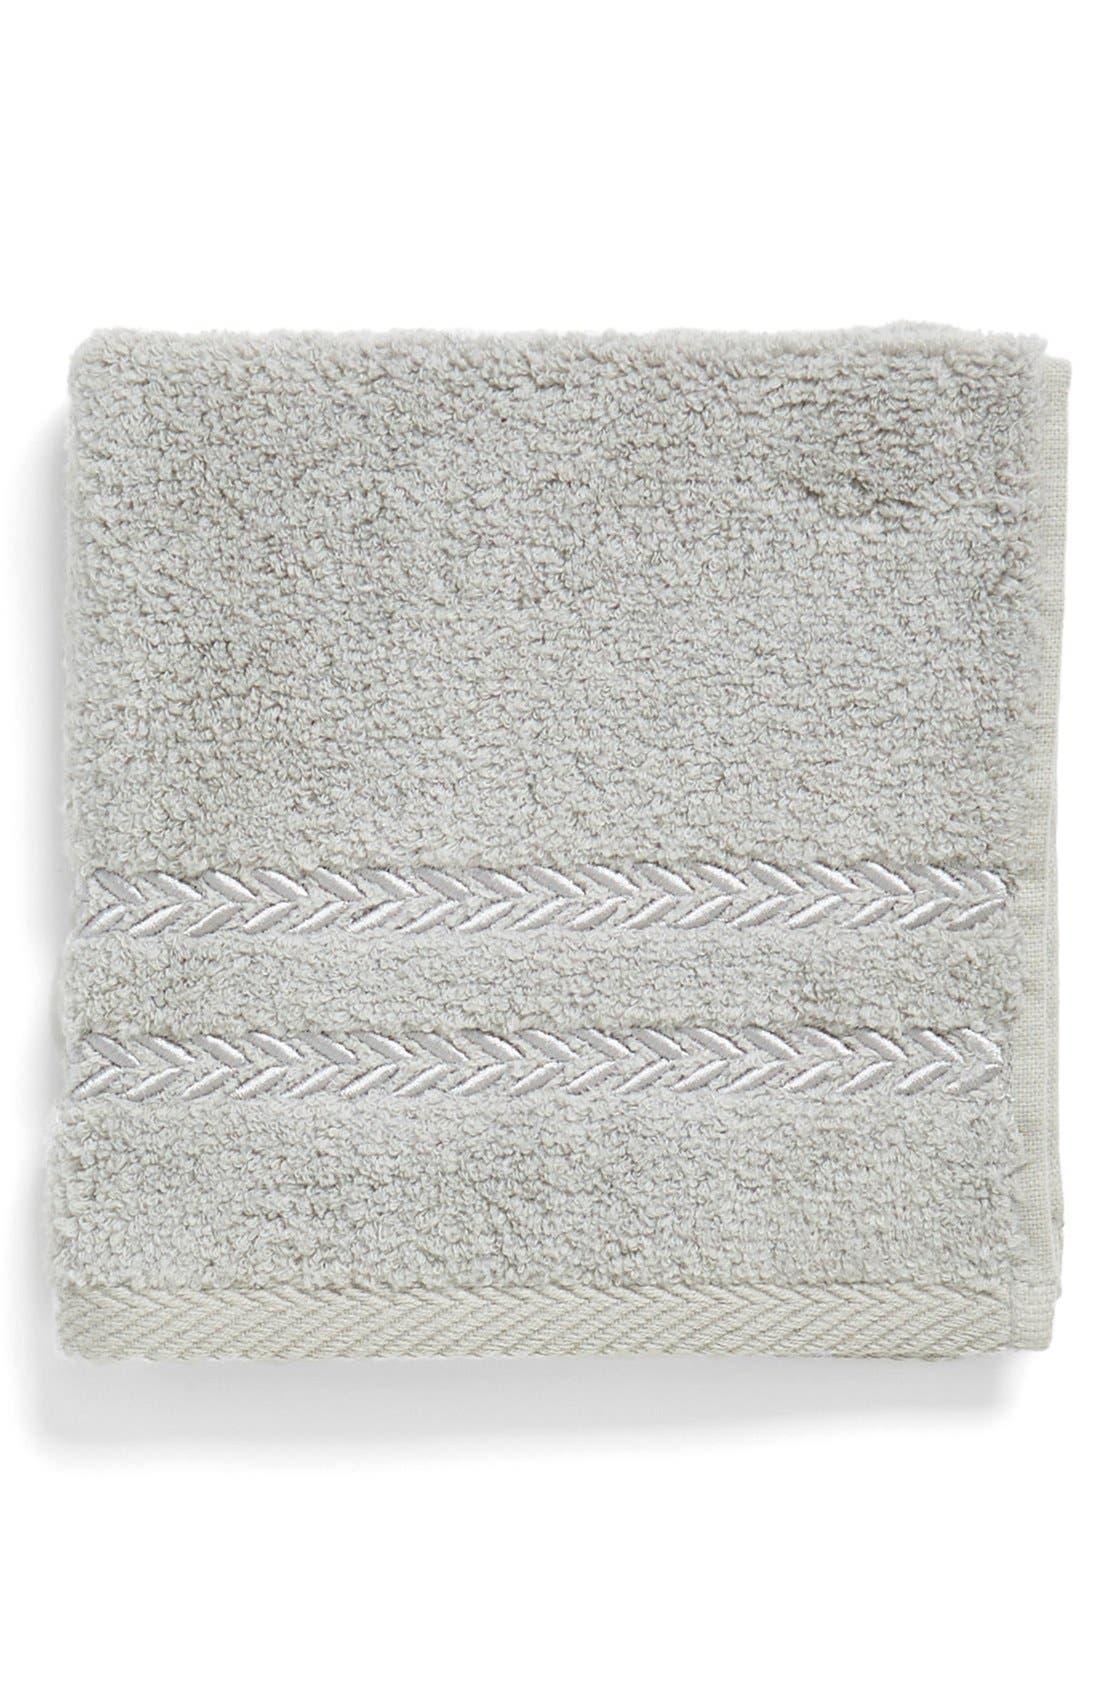 'Pearl Essence' Wash Towel,                             Main thumbnail 2, color,